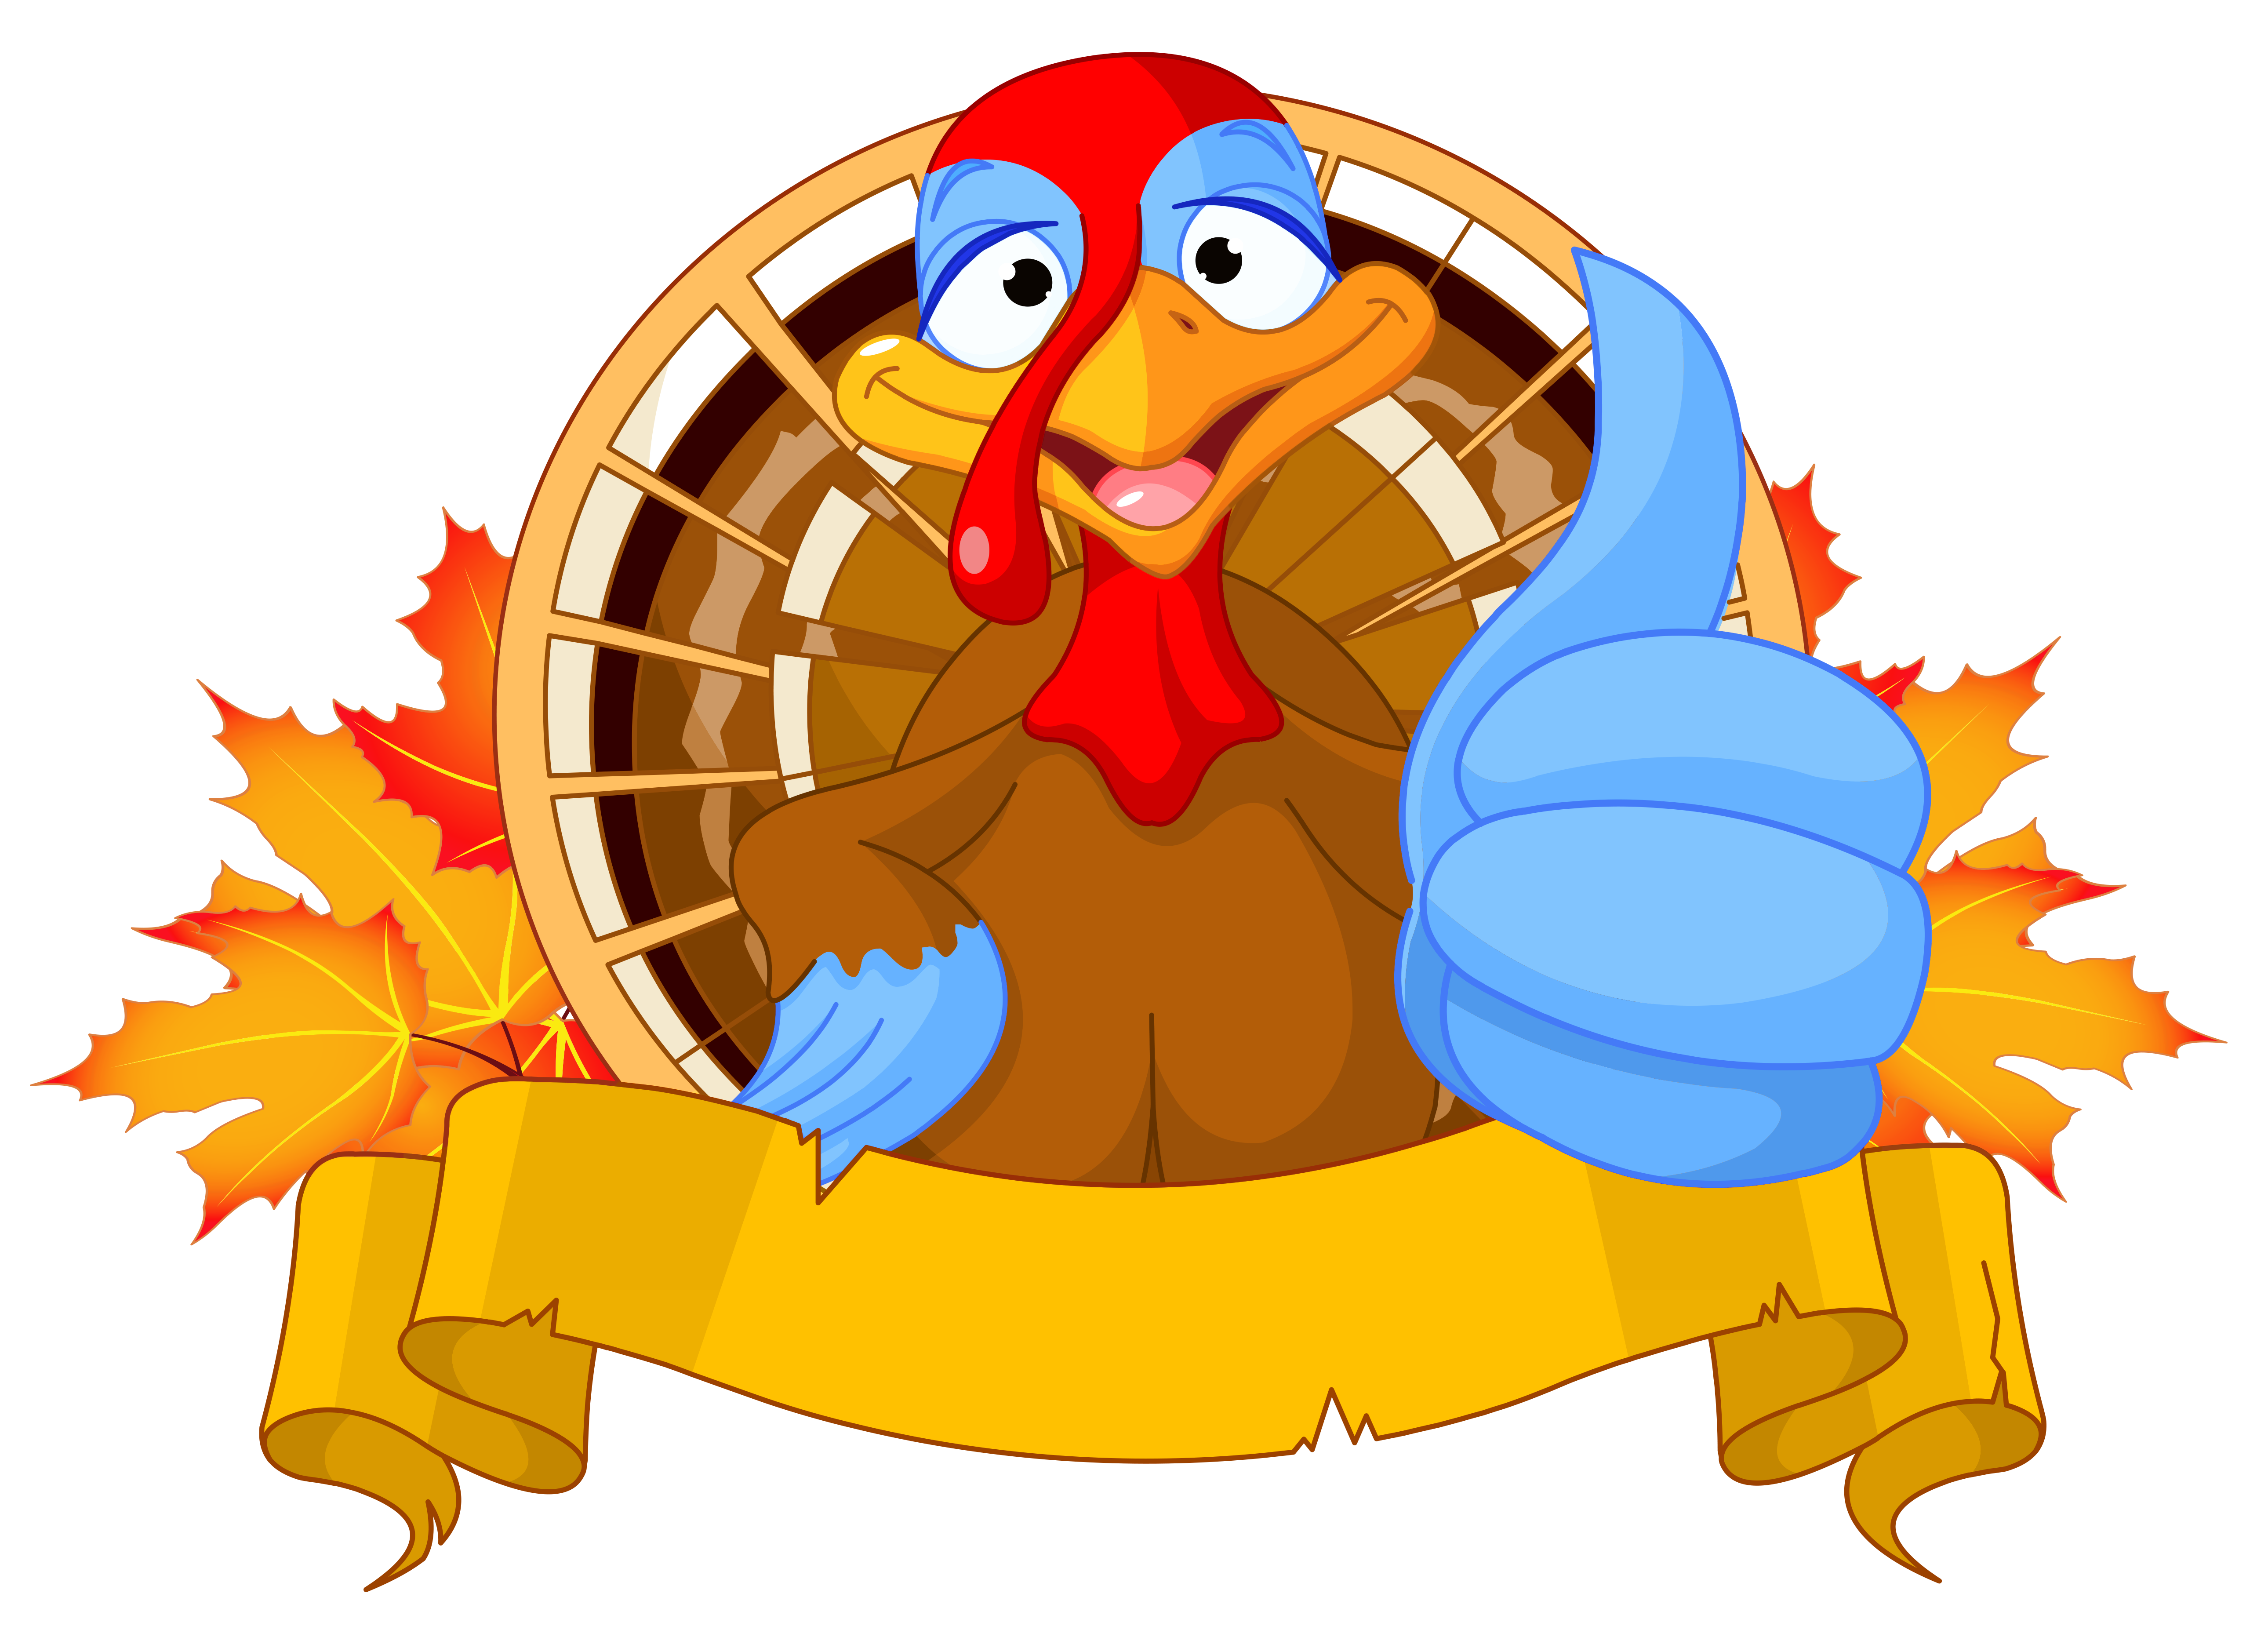 5160x3699 Transparent Thanksgiving Turkey Clipart Pictureu200b Gallery